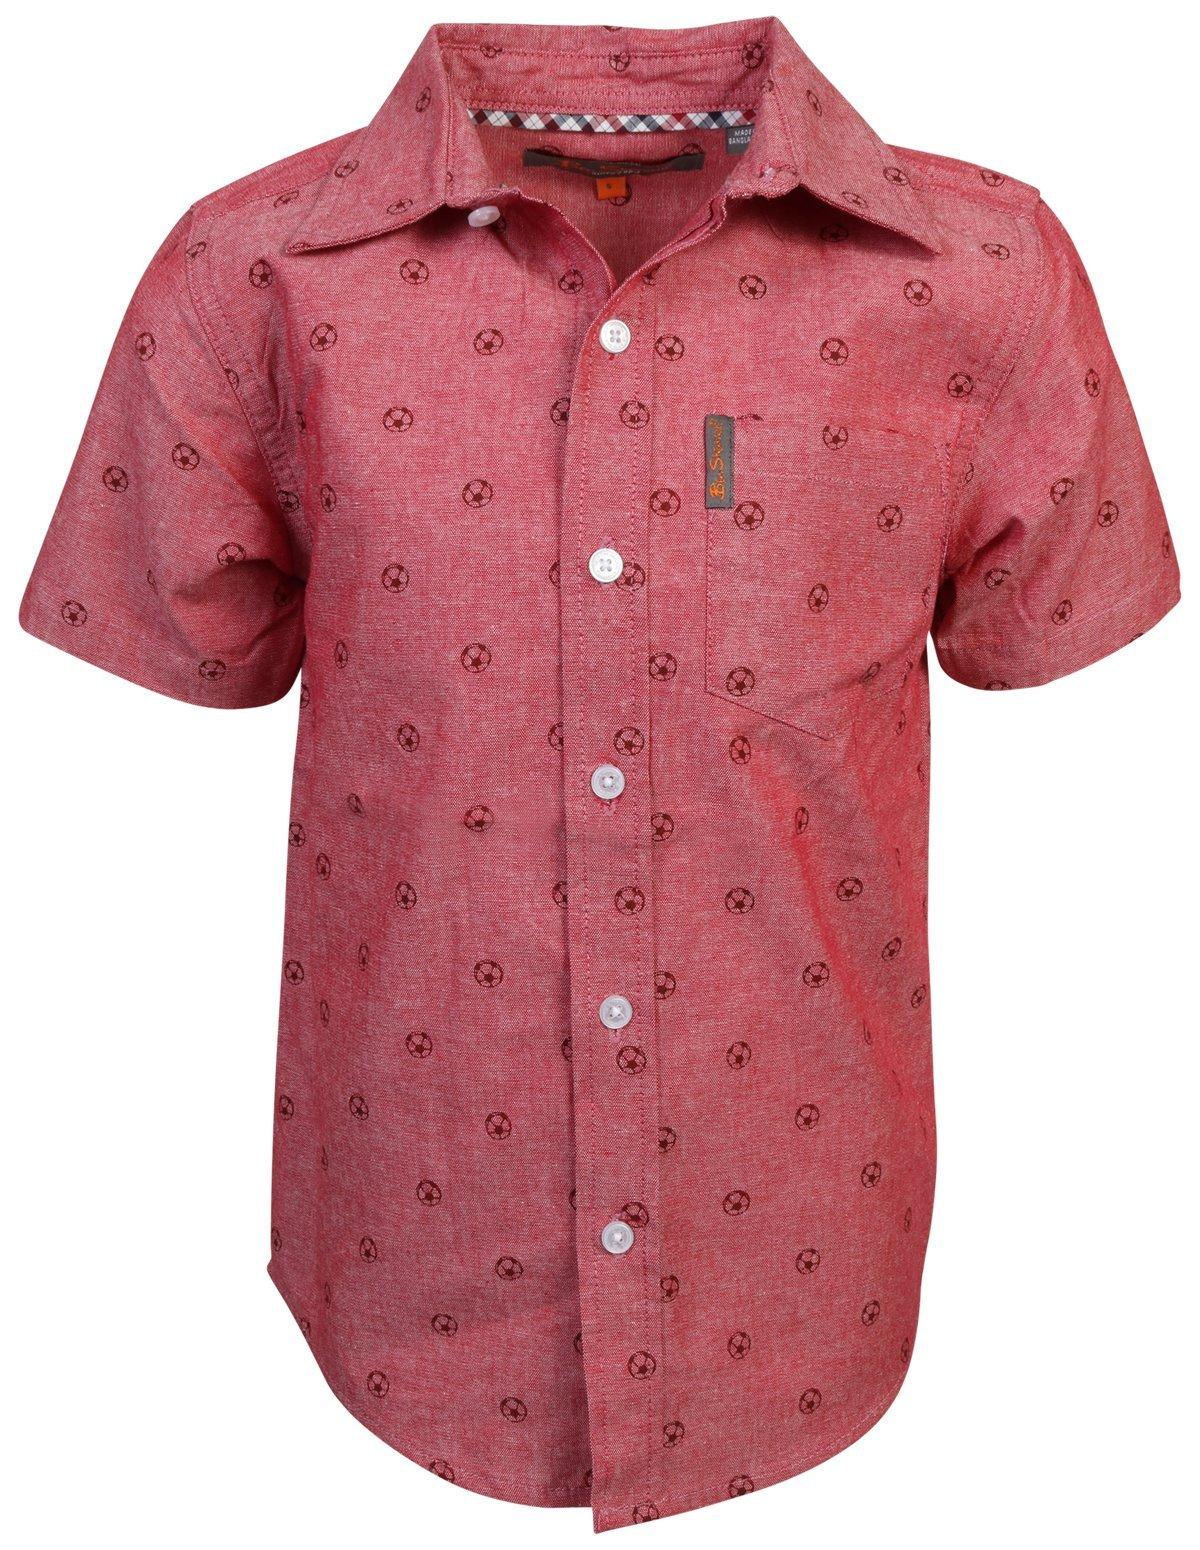 Ben Sherman Boys Short Sleeve Button Down Shirt (Coral Soccer Ball, 4)